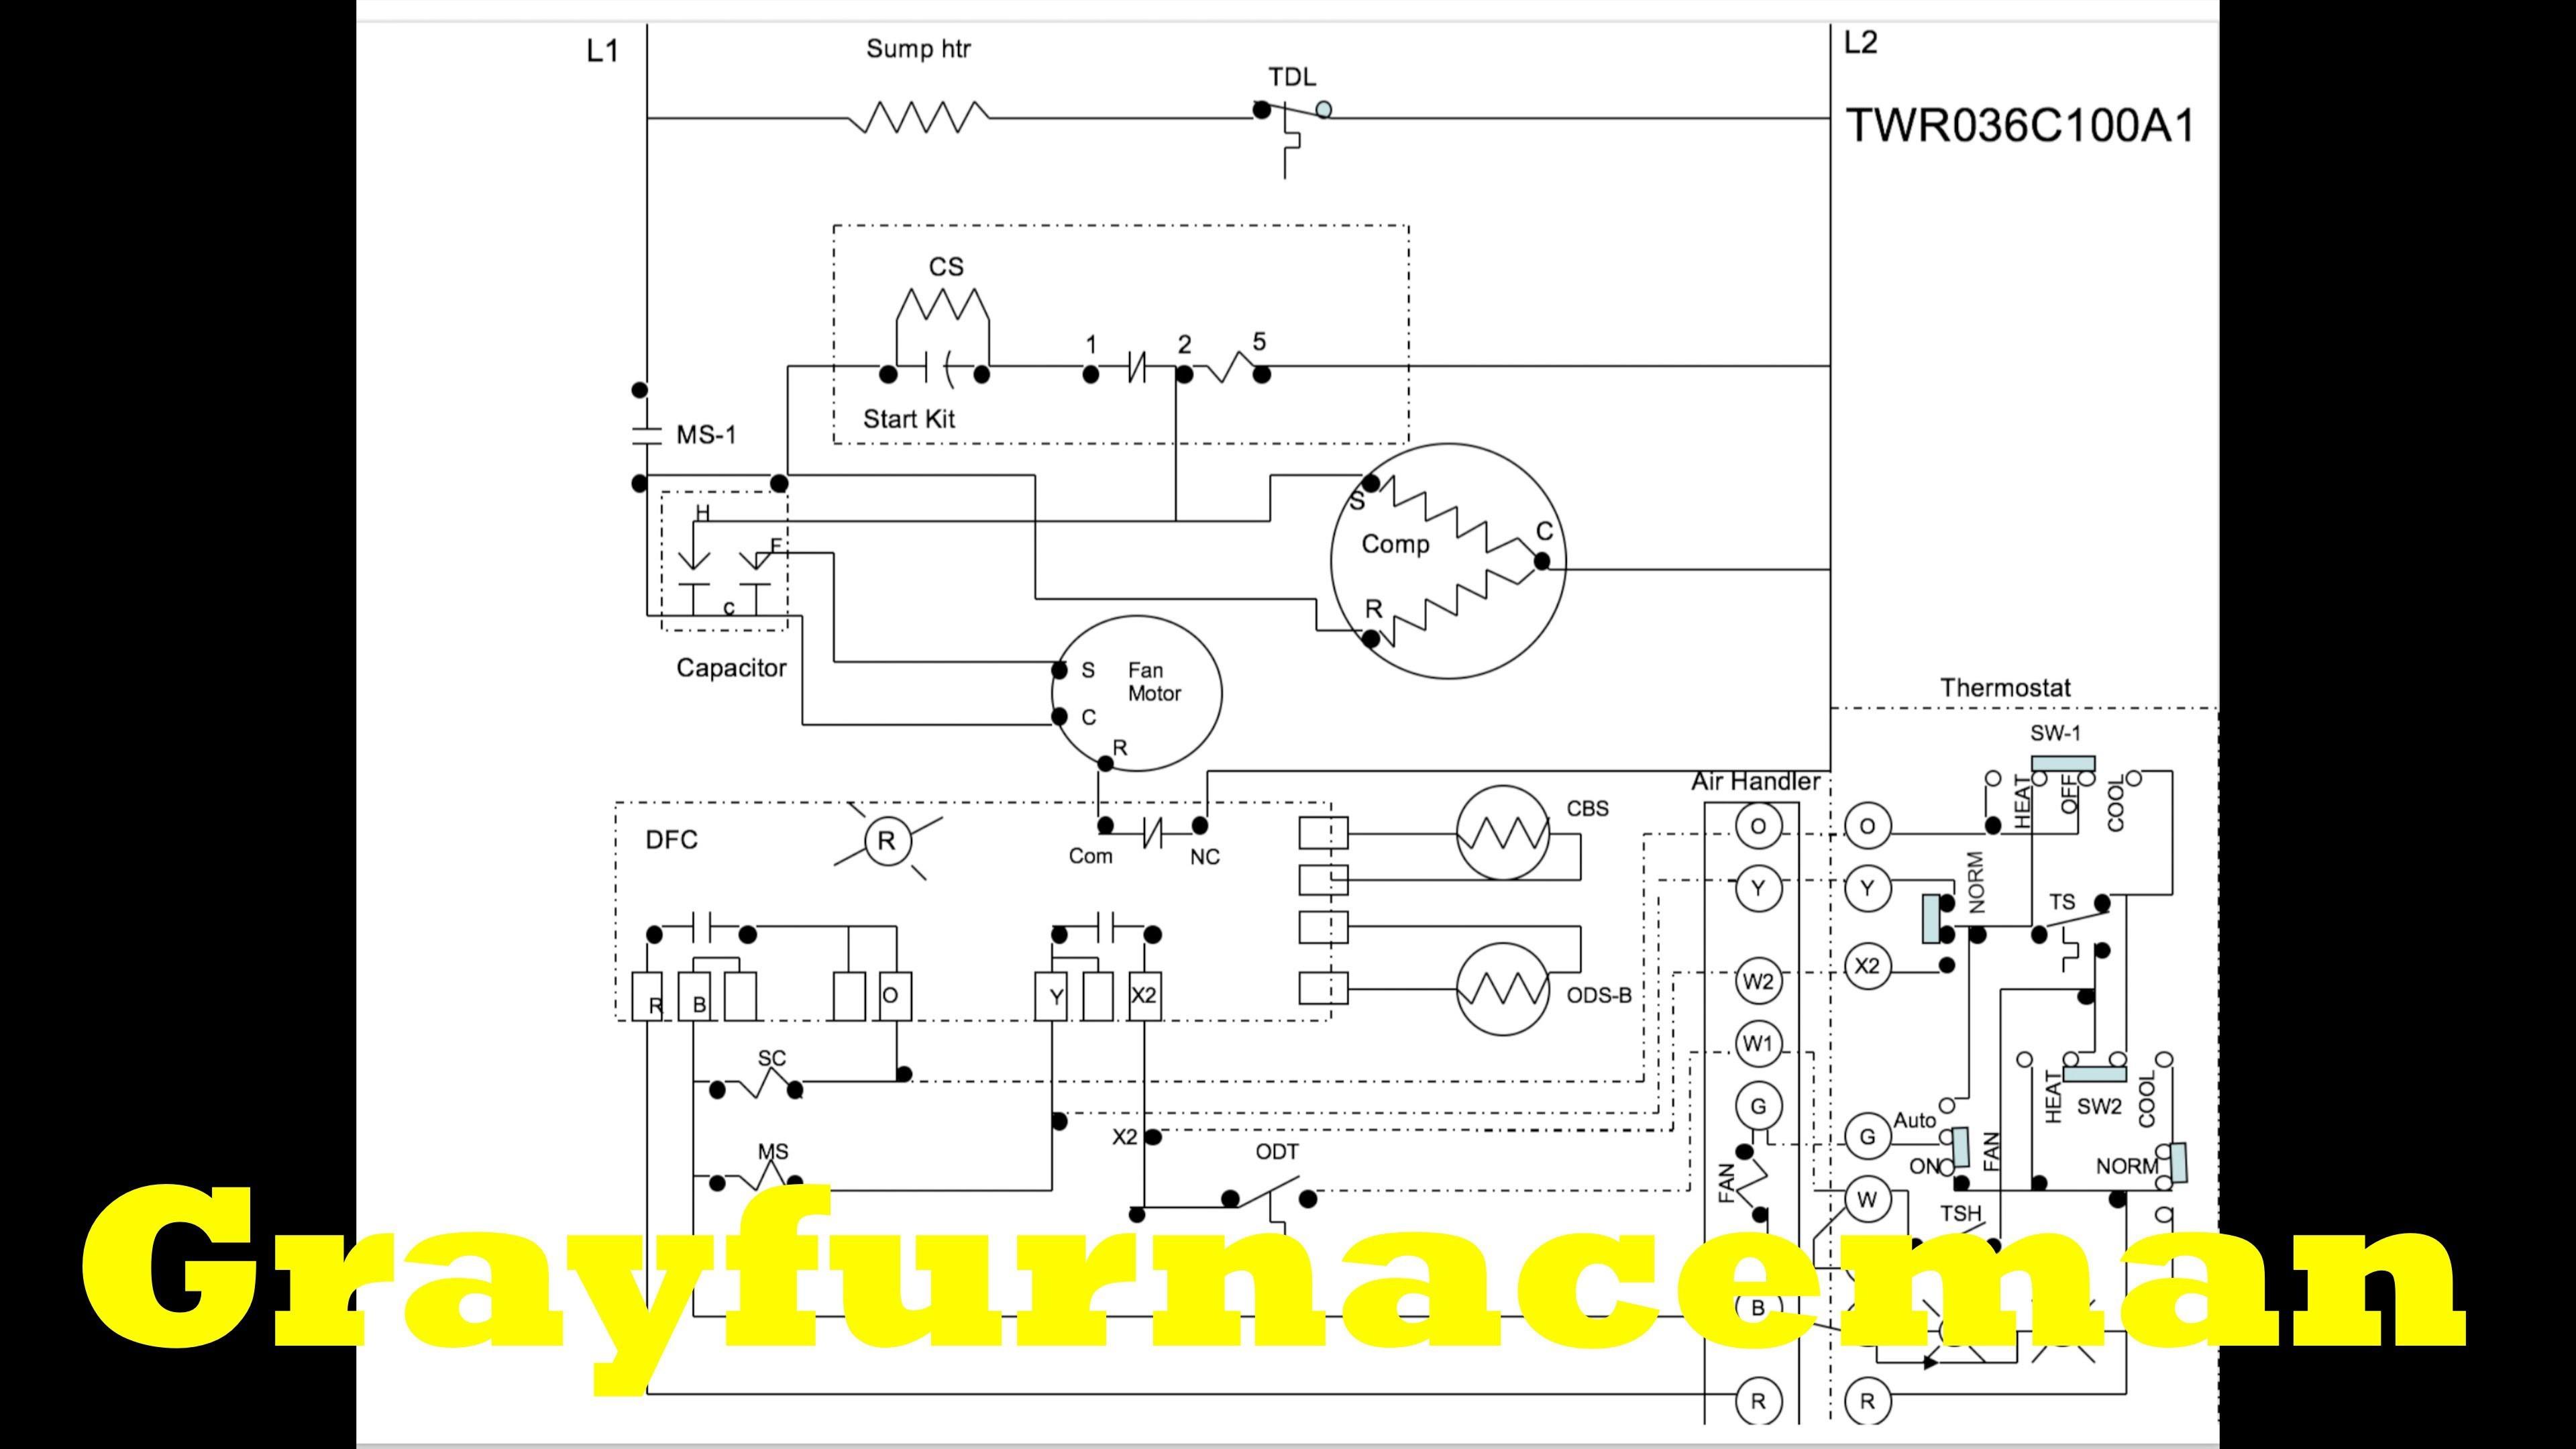 Carrier Heat Pump Wiring Diagram Goodman Heat Pump Wiring Diagram Fresh Heat Pump Wiring Diagrams Of Carrier Heat Pump Wiring Diagram